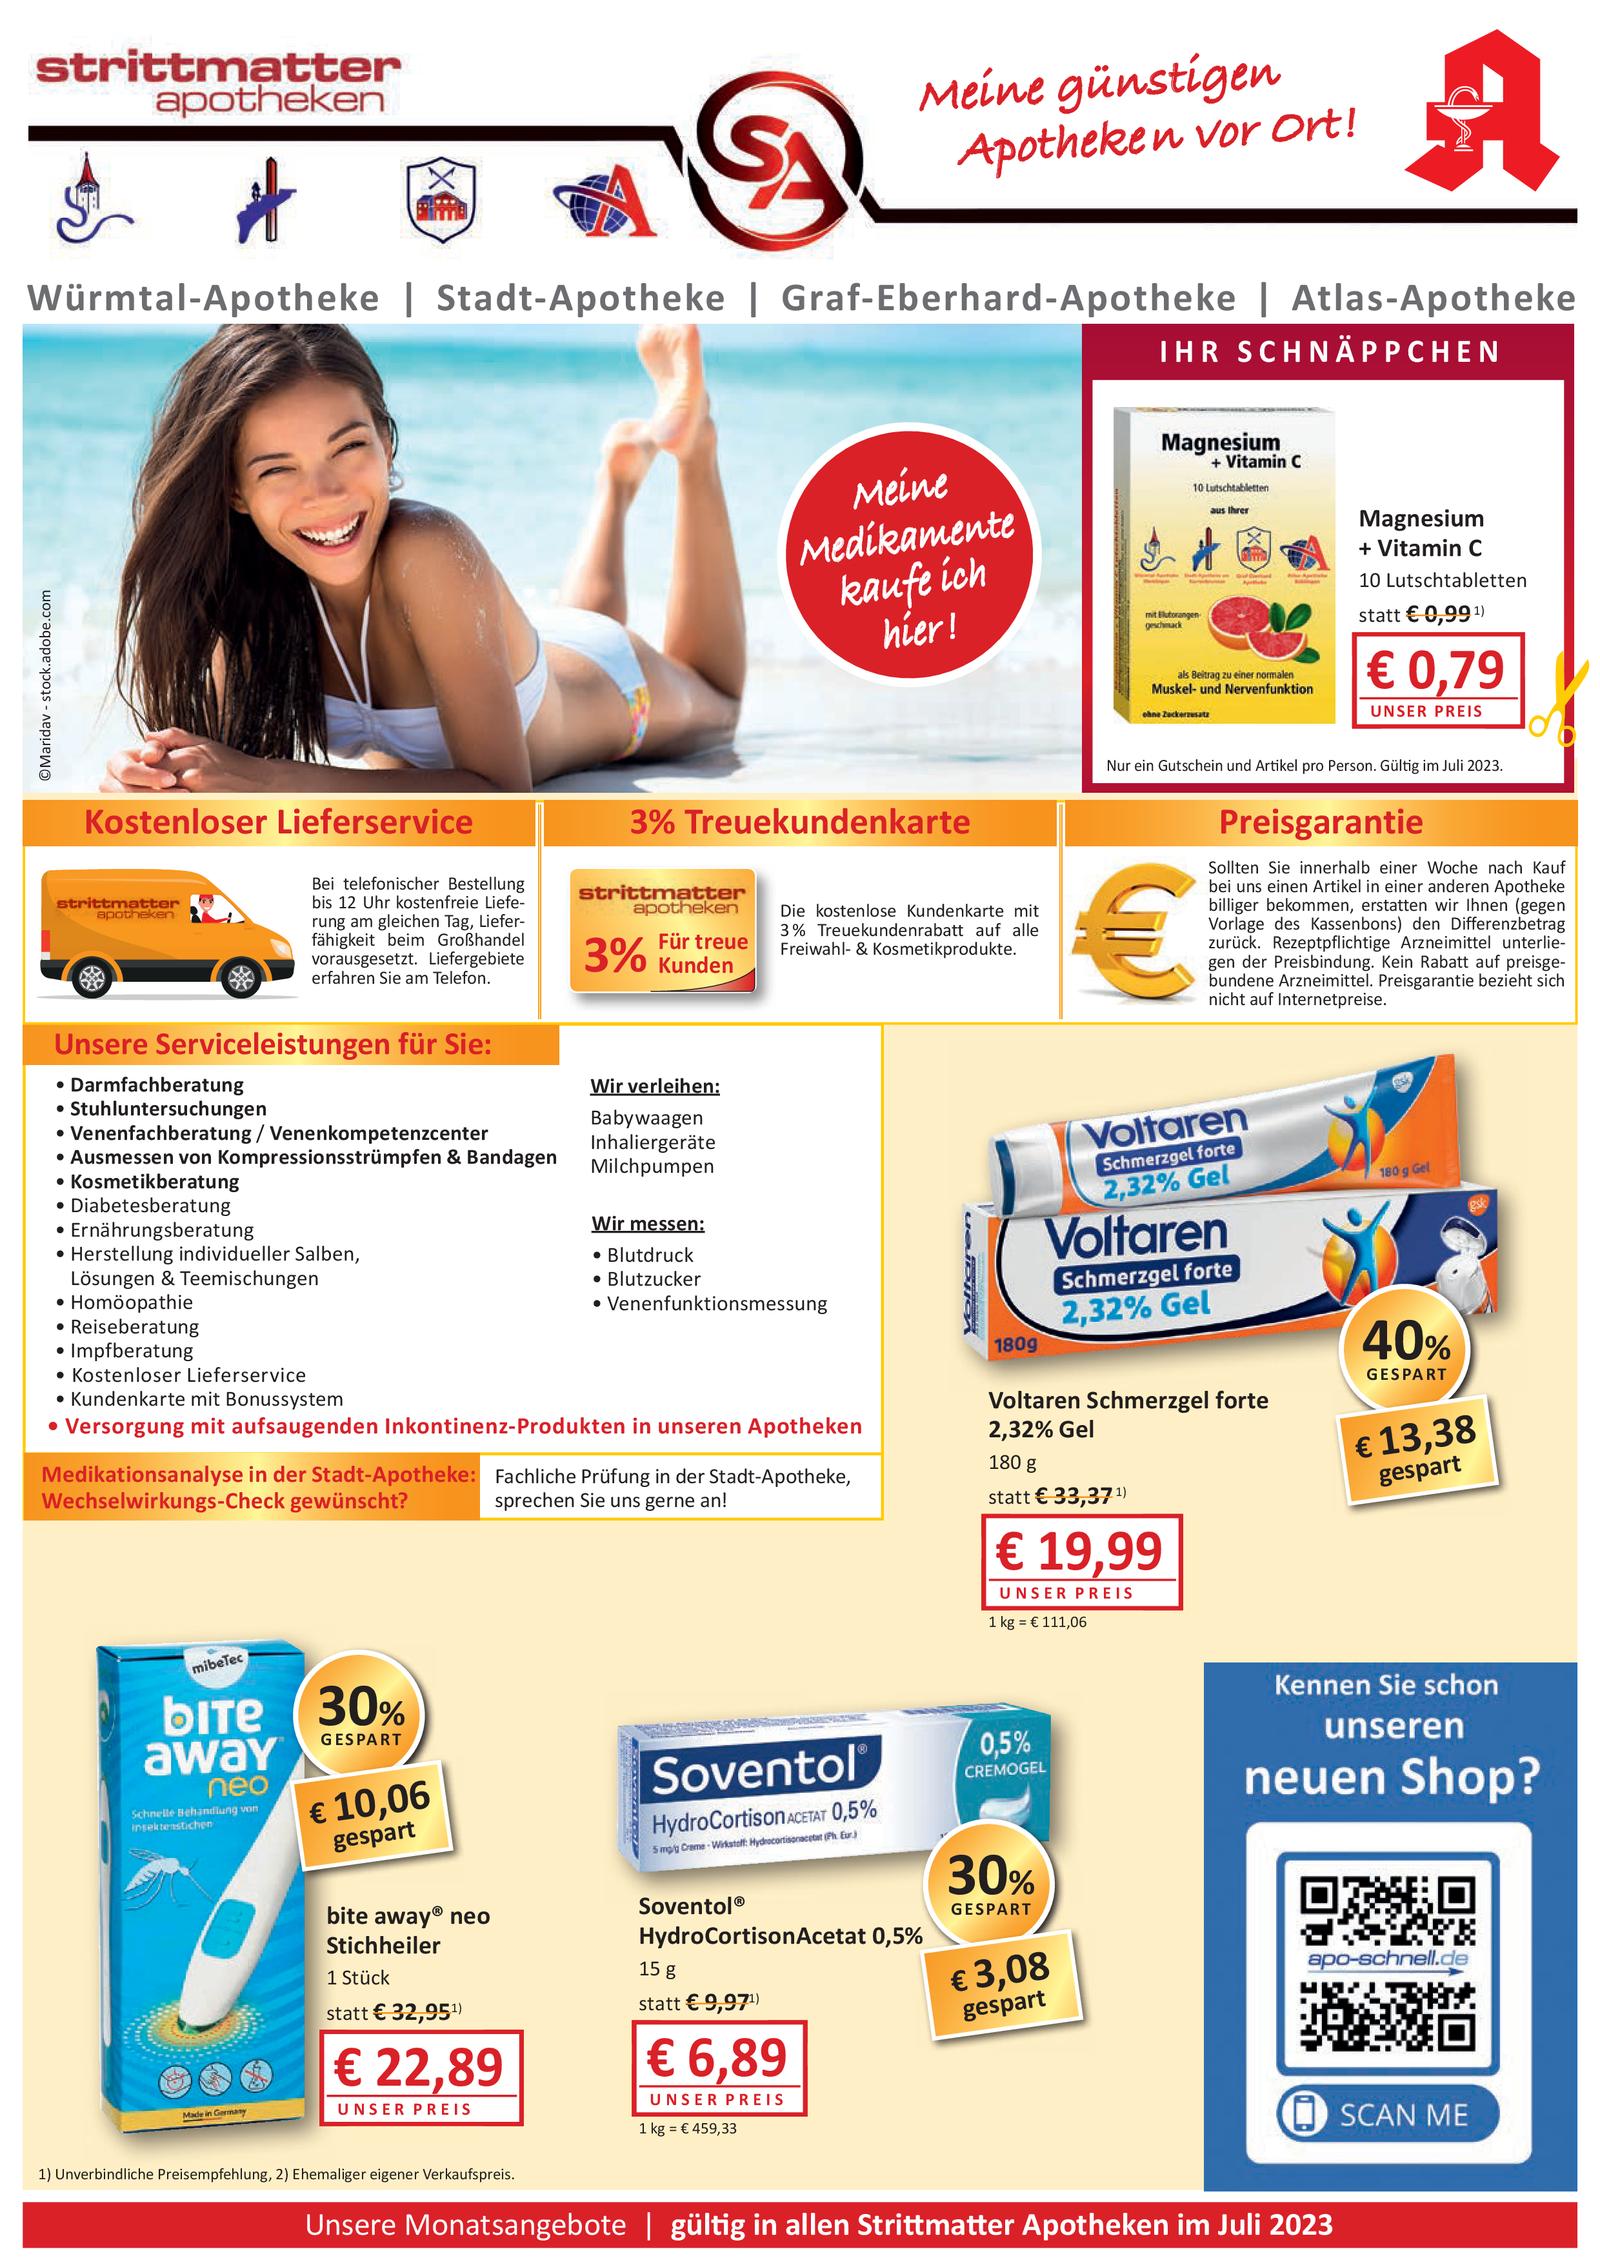 https://mein-uploads.apocdn.net/2425/leaflets/2425_flyer-Seite1.png